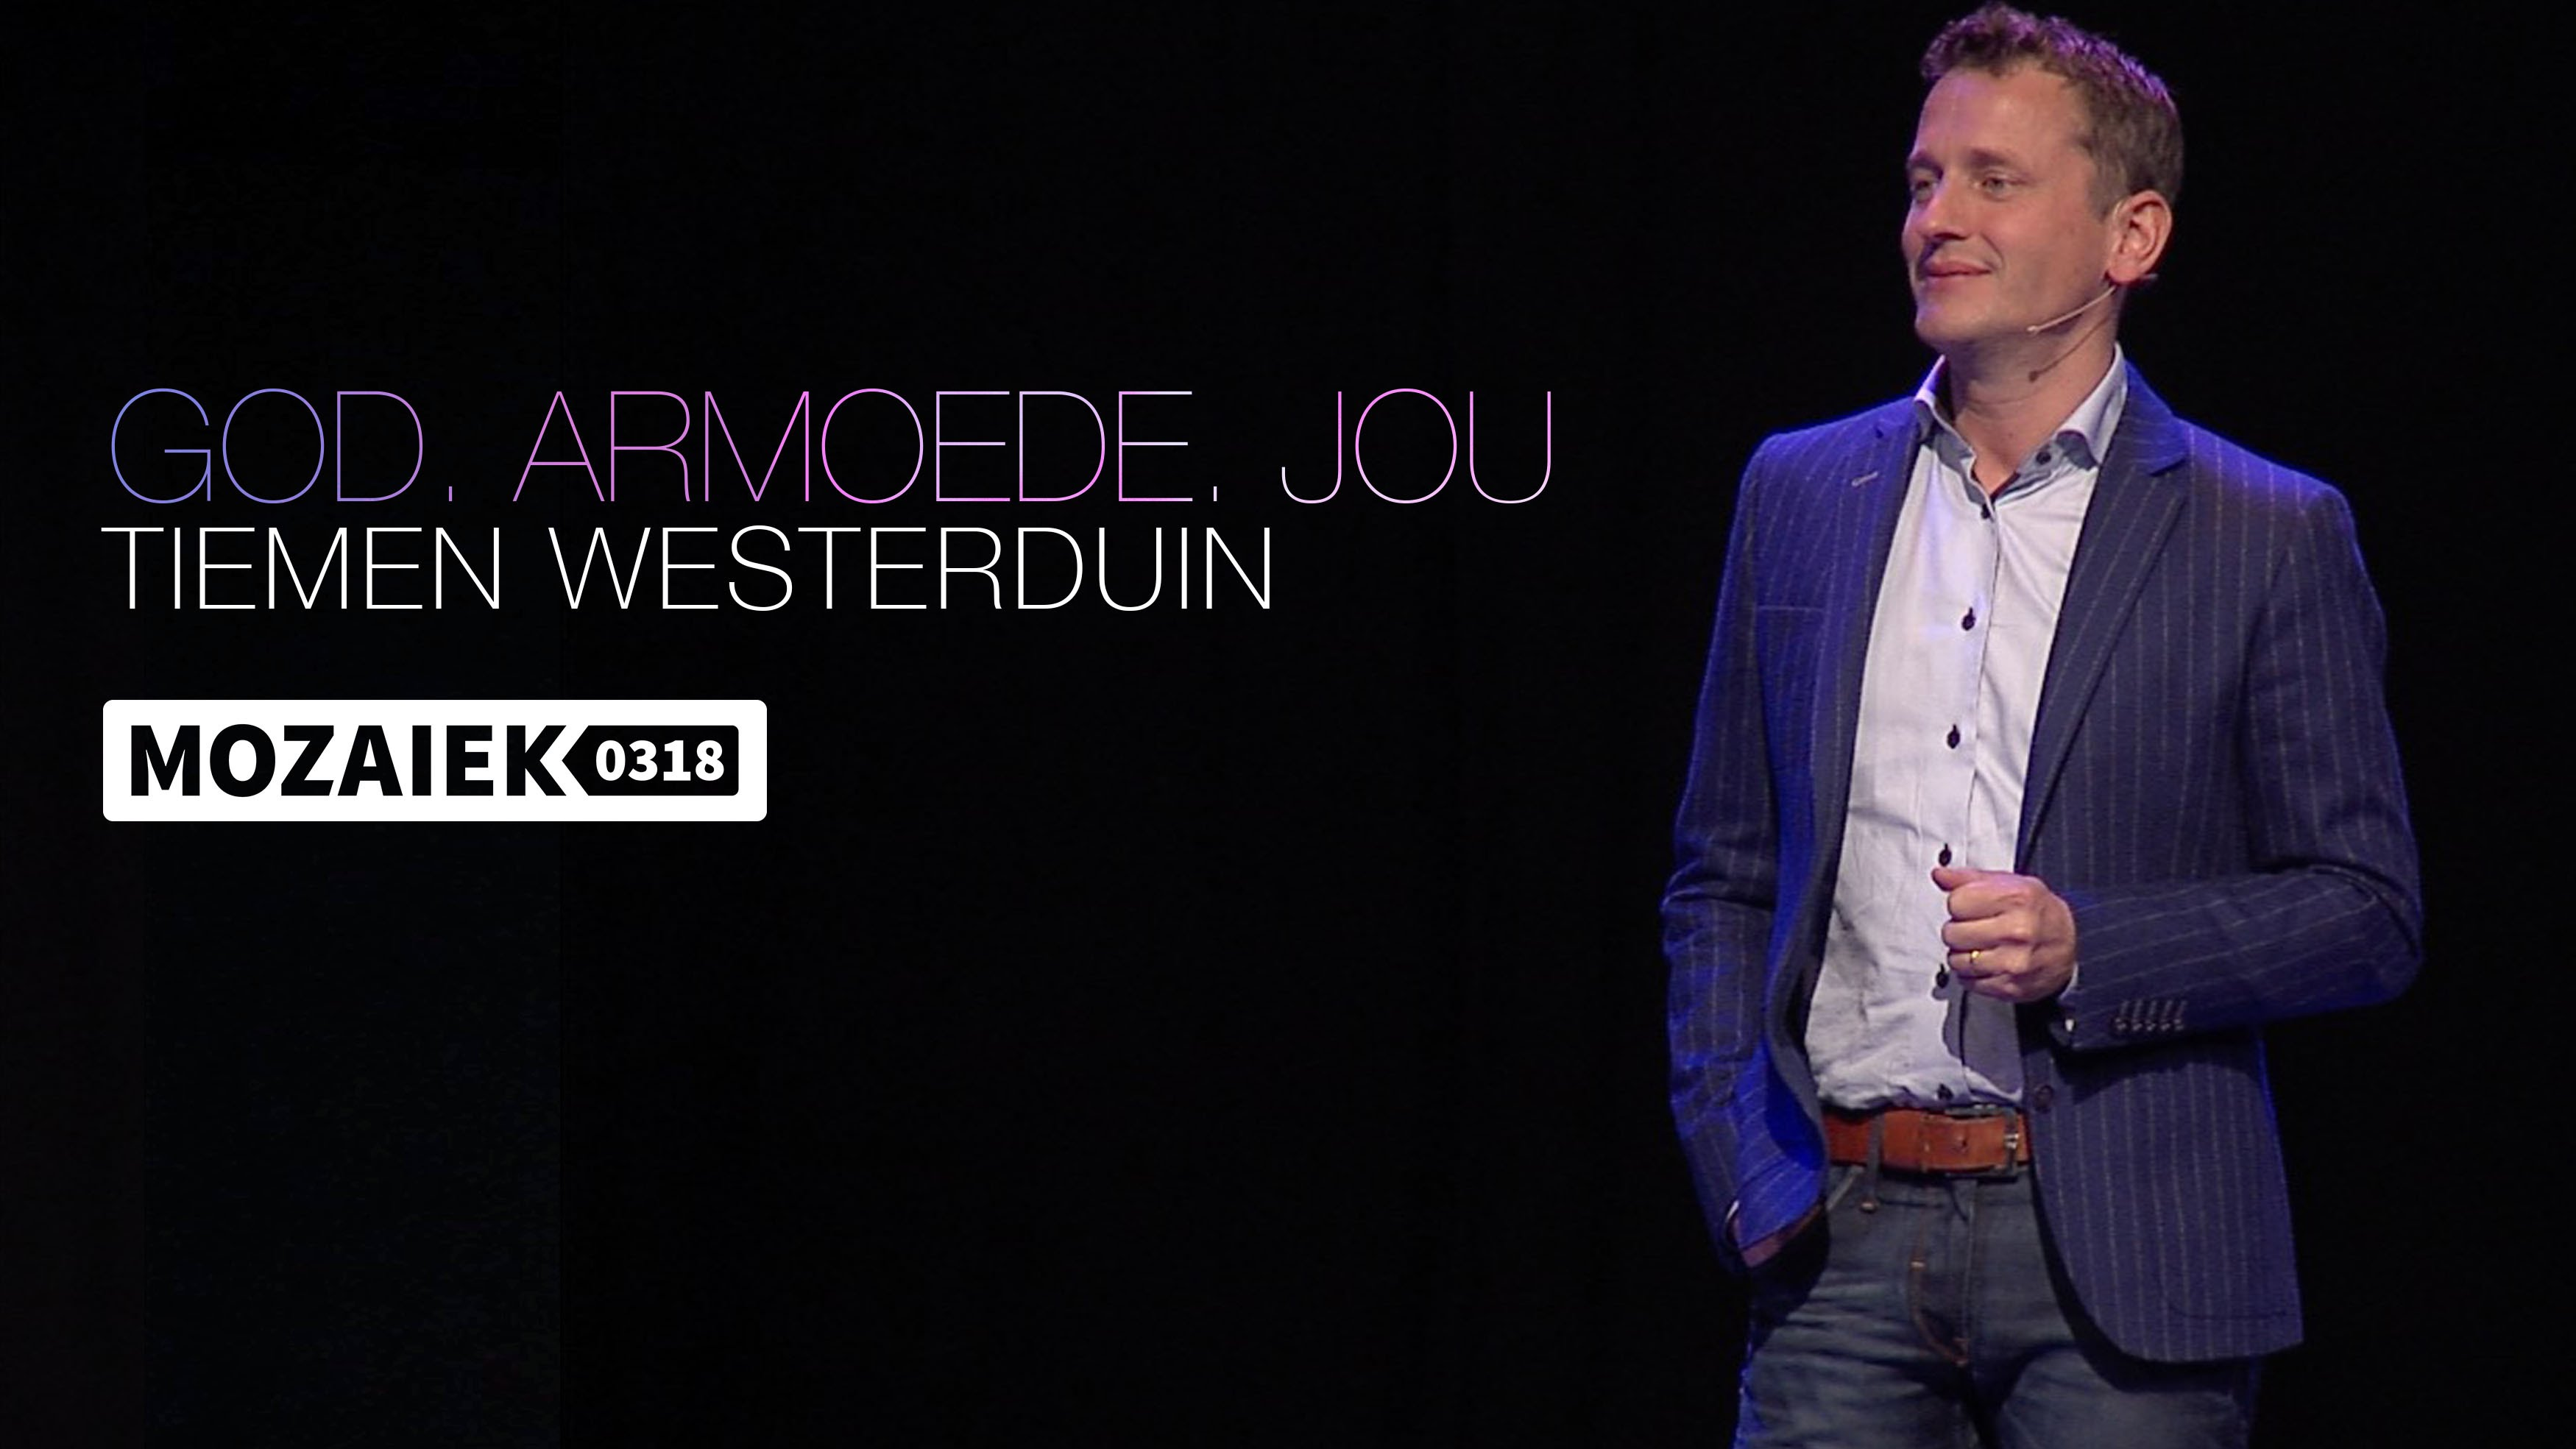 Tiemen Westerduin - God, armoede, jou 4